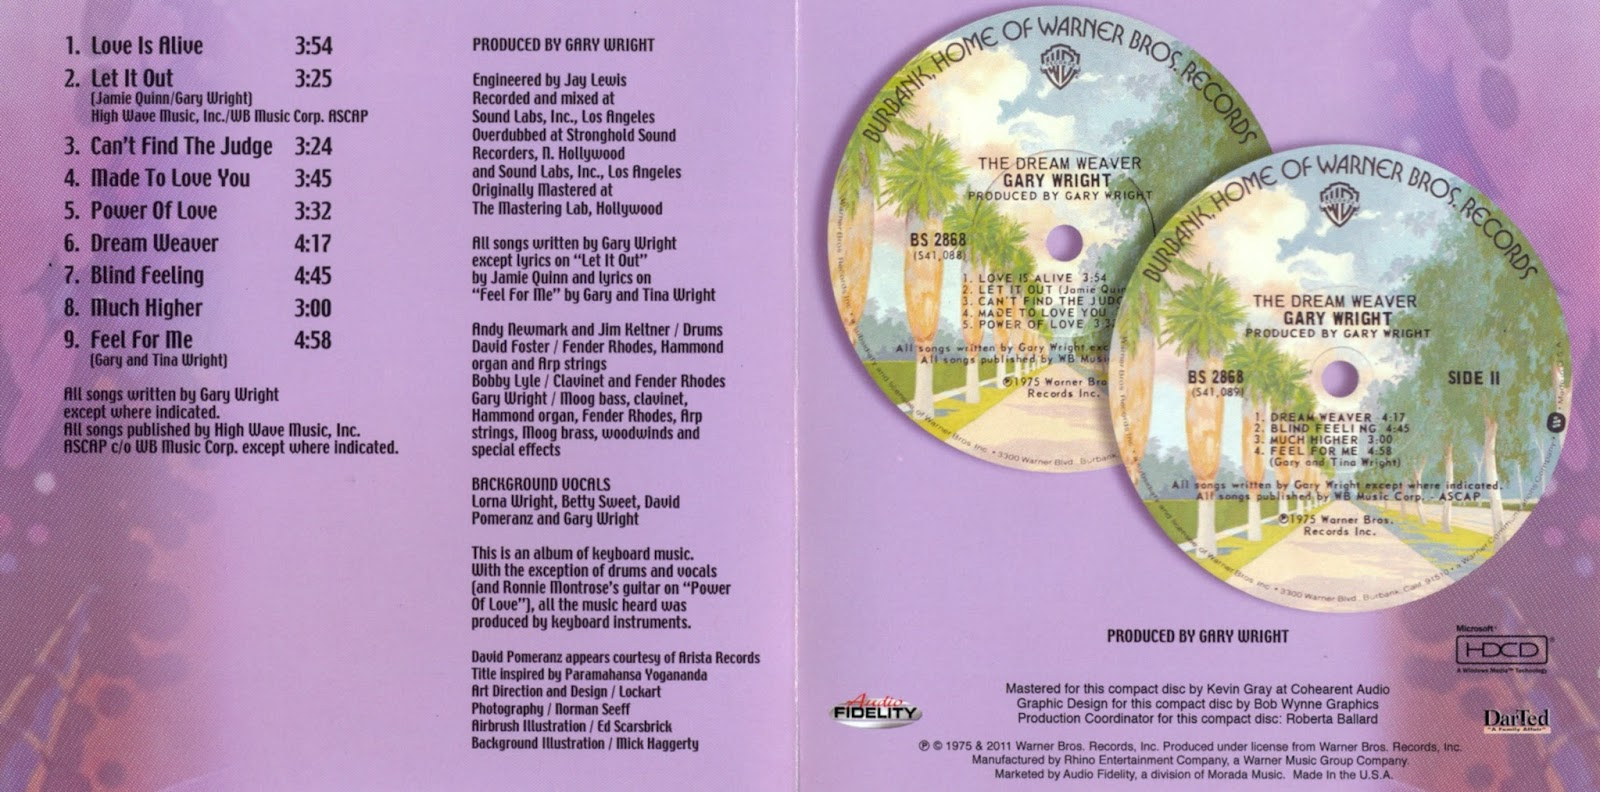 Rockronologia 1975 The Dream Weaver Gary Wright